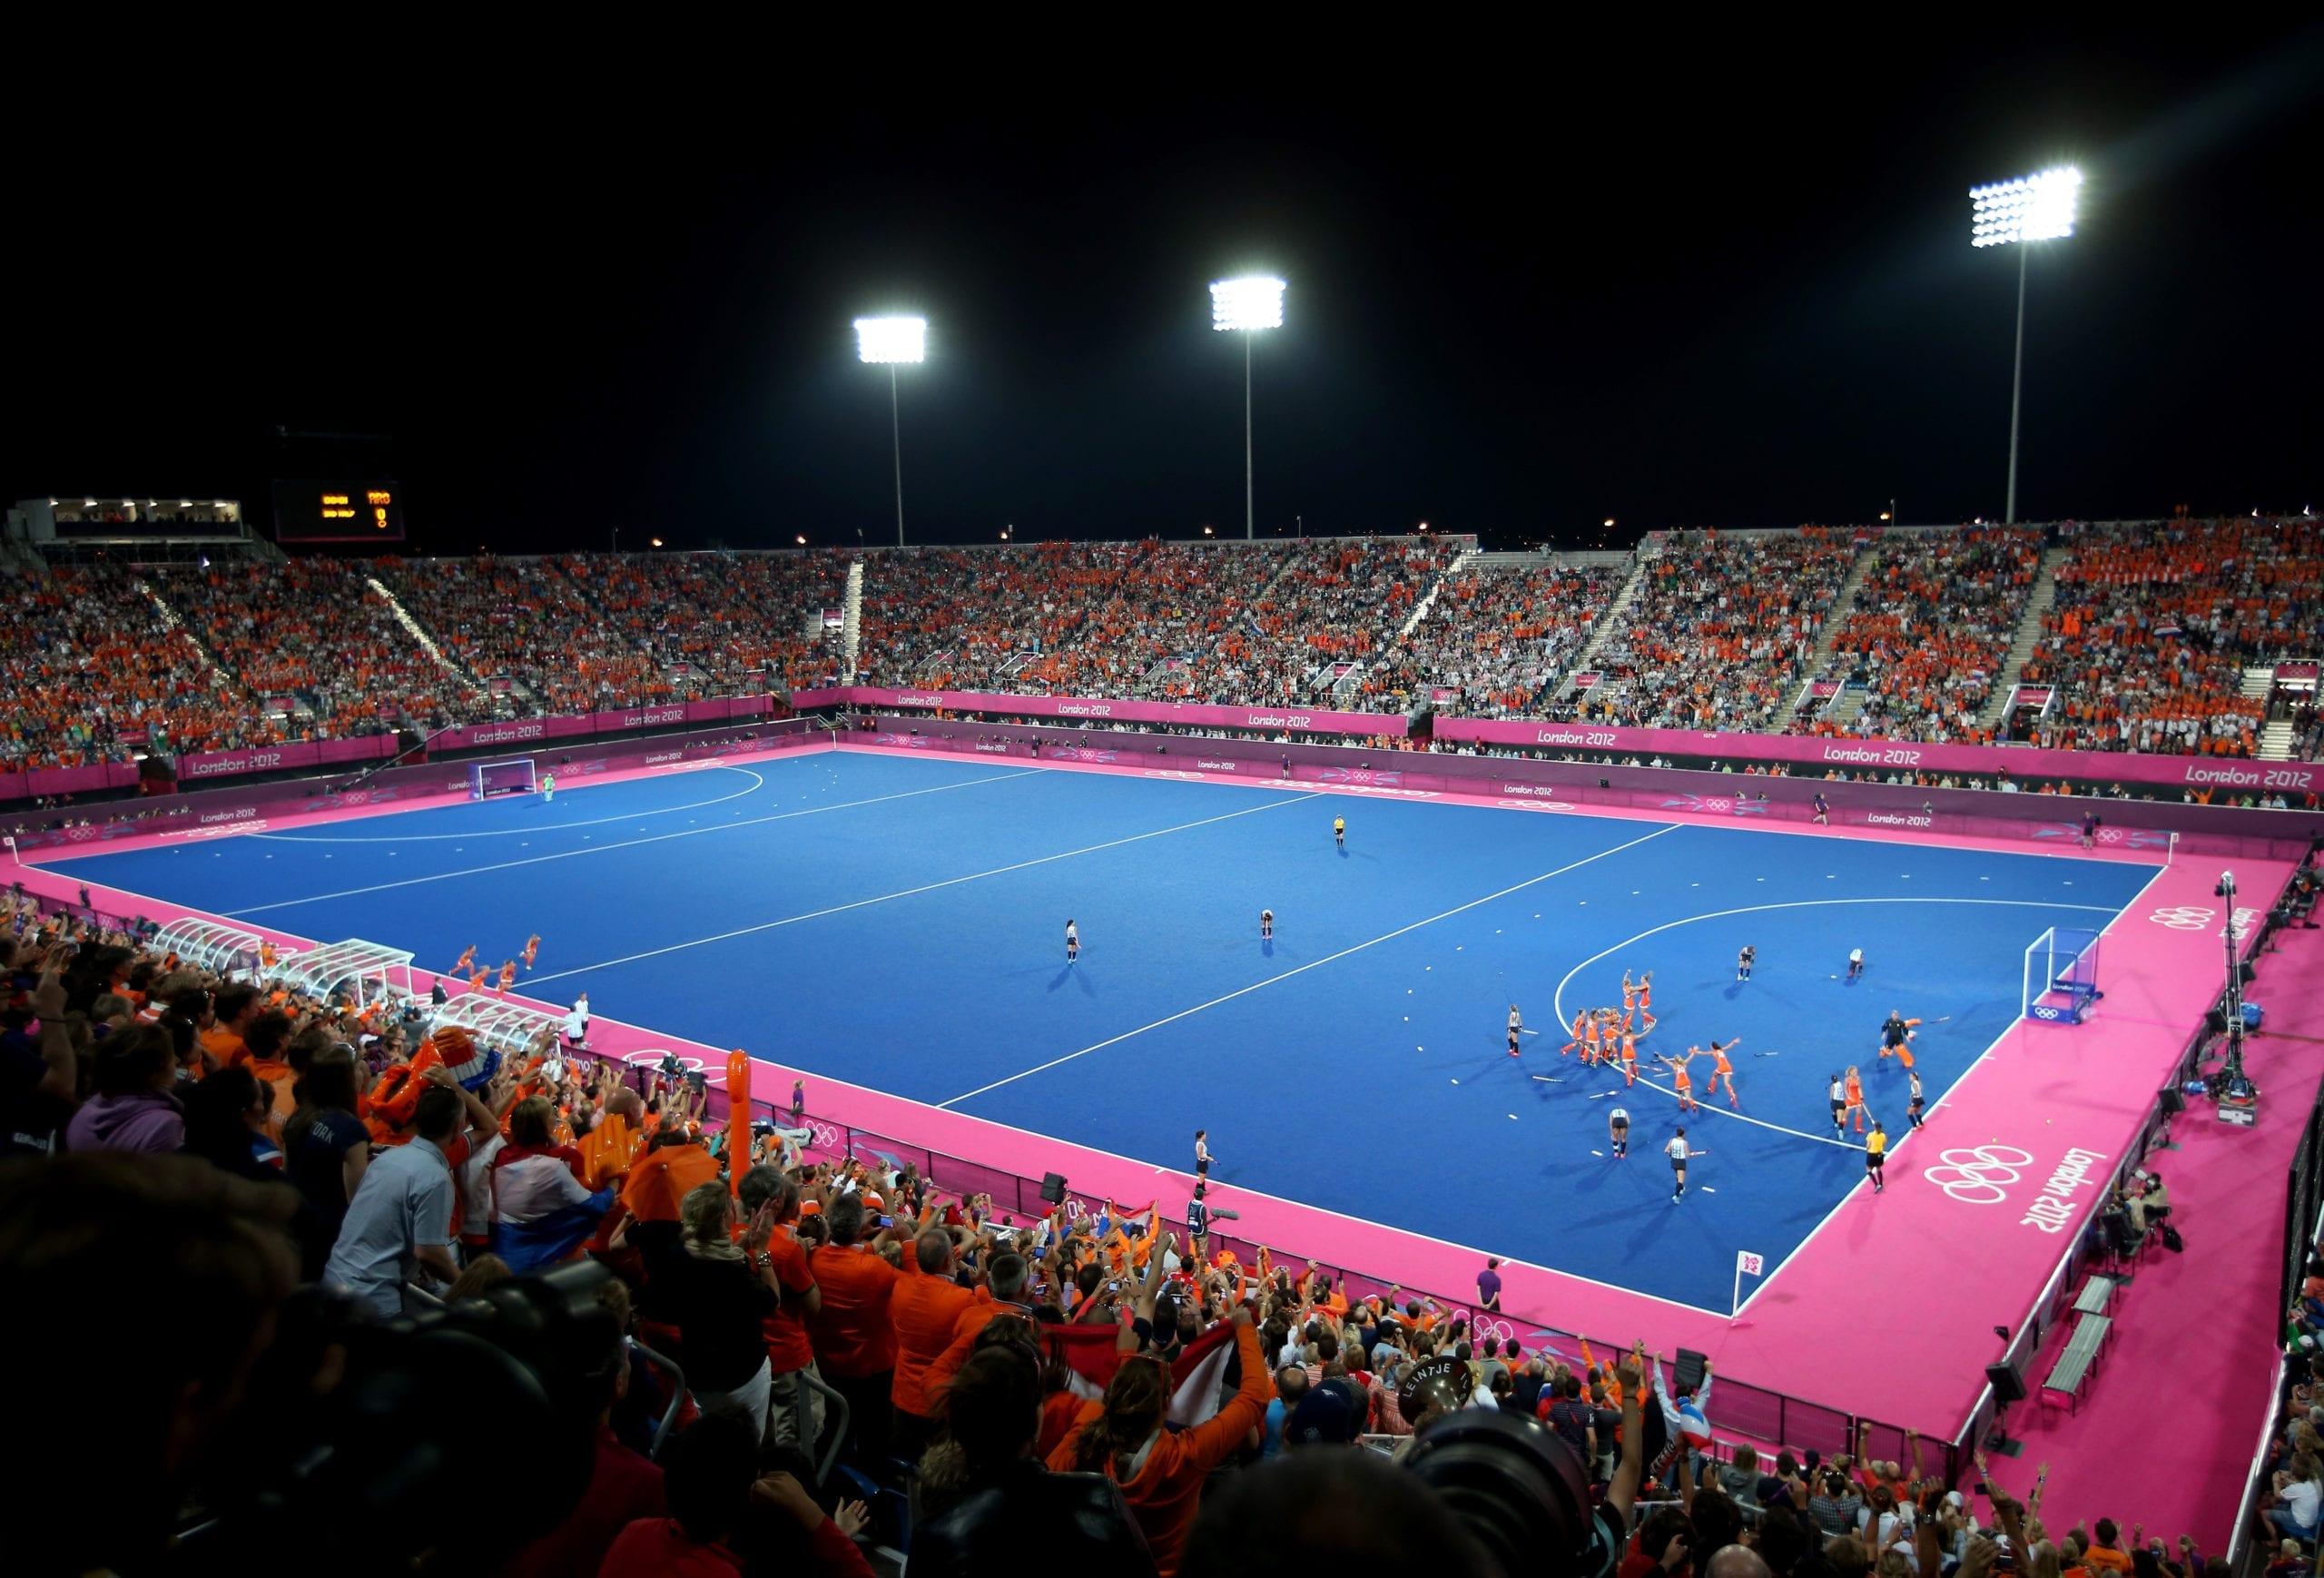 Hockey stadium Olympic Games 2012 London.